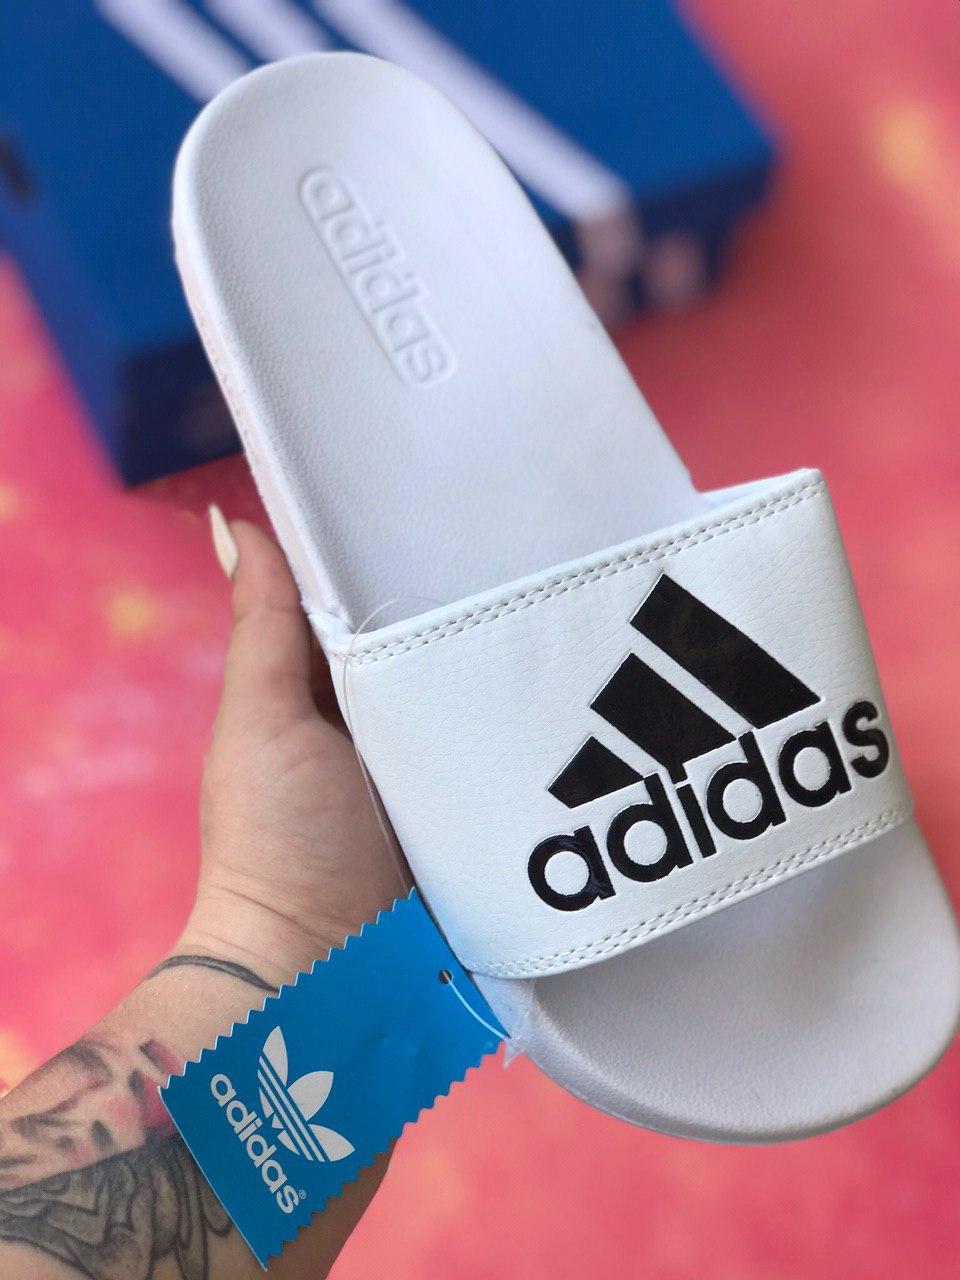 Сланцы/шлепки Adidas (белые)/шлепанцы/Adidas/ адидас/